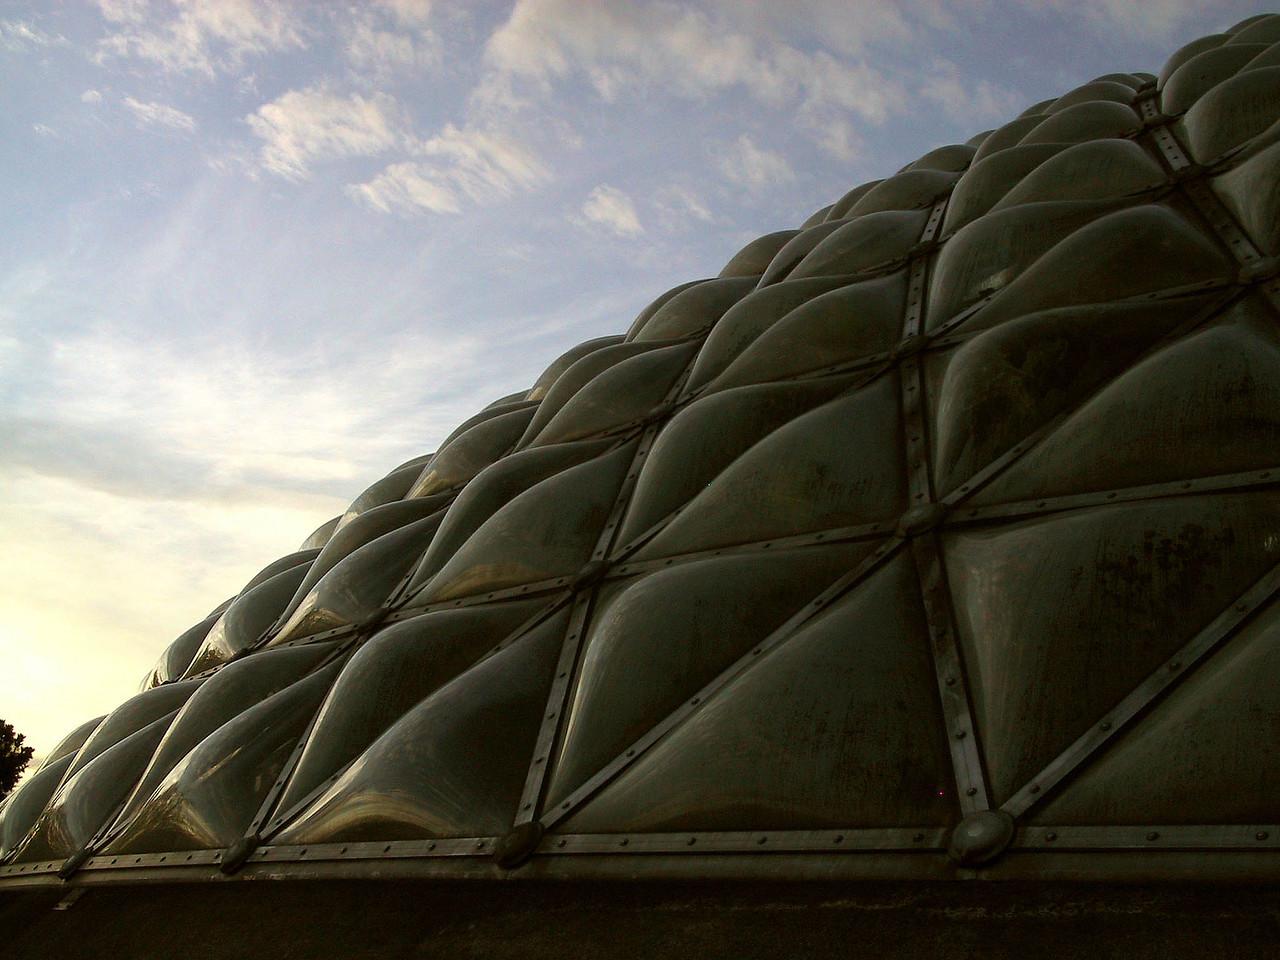 MacMillan Bloedel Conservatory at Sunset.